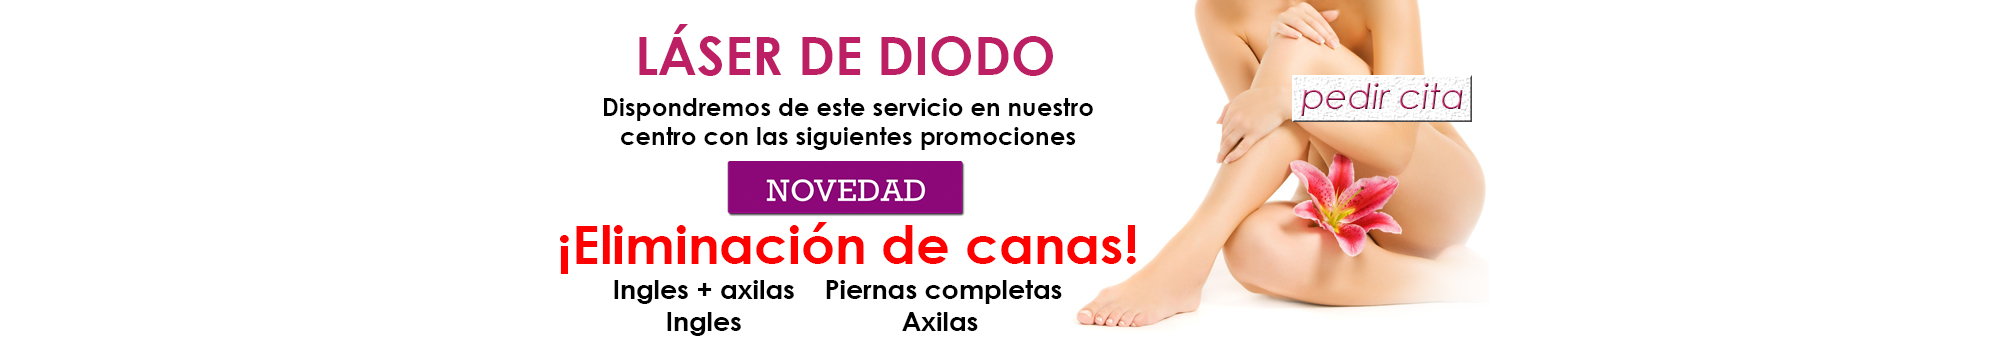 Estilistas en Vega Baja, esteticen en Callosa de Segura, Maquilladora en Vega Baja